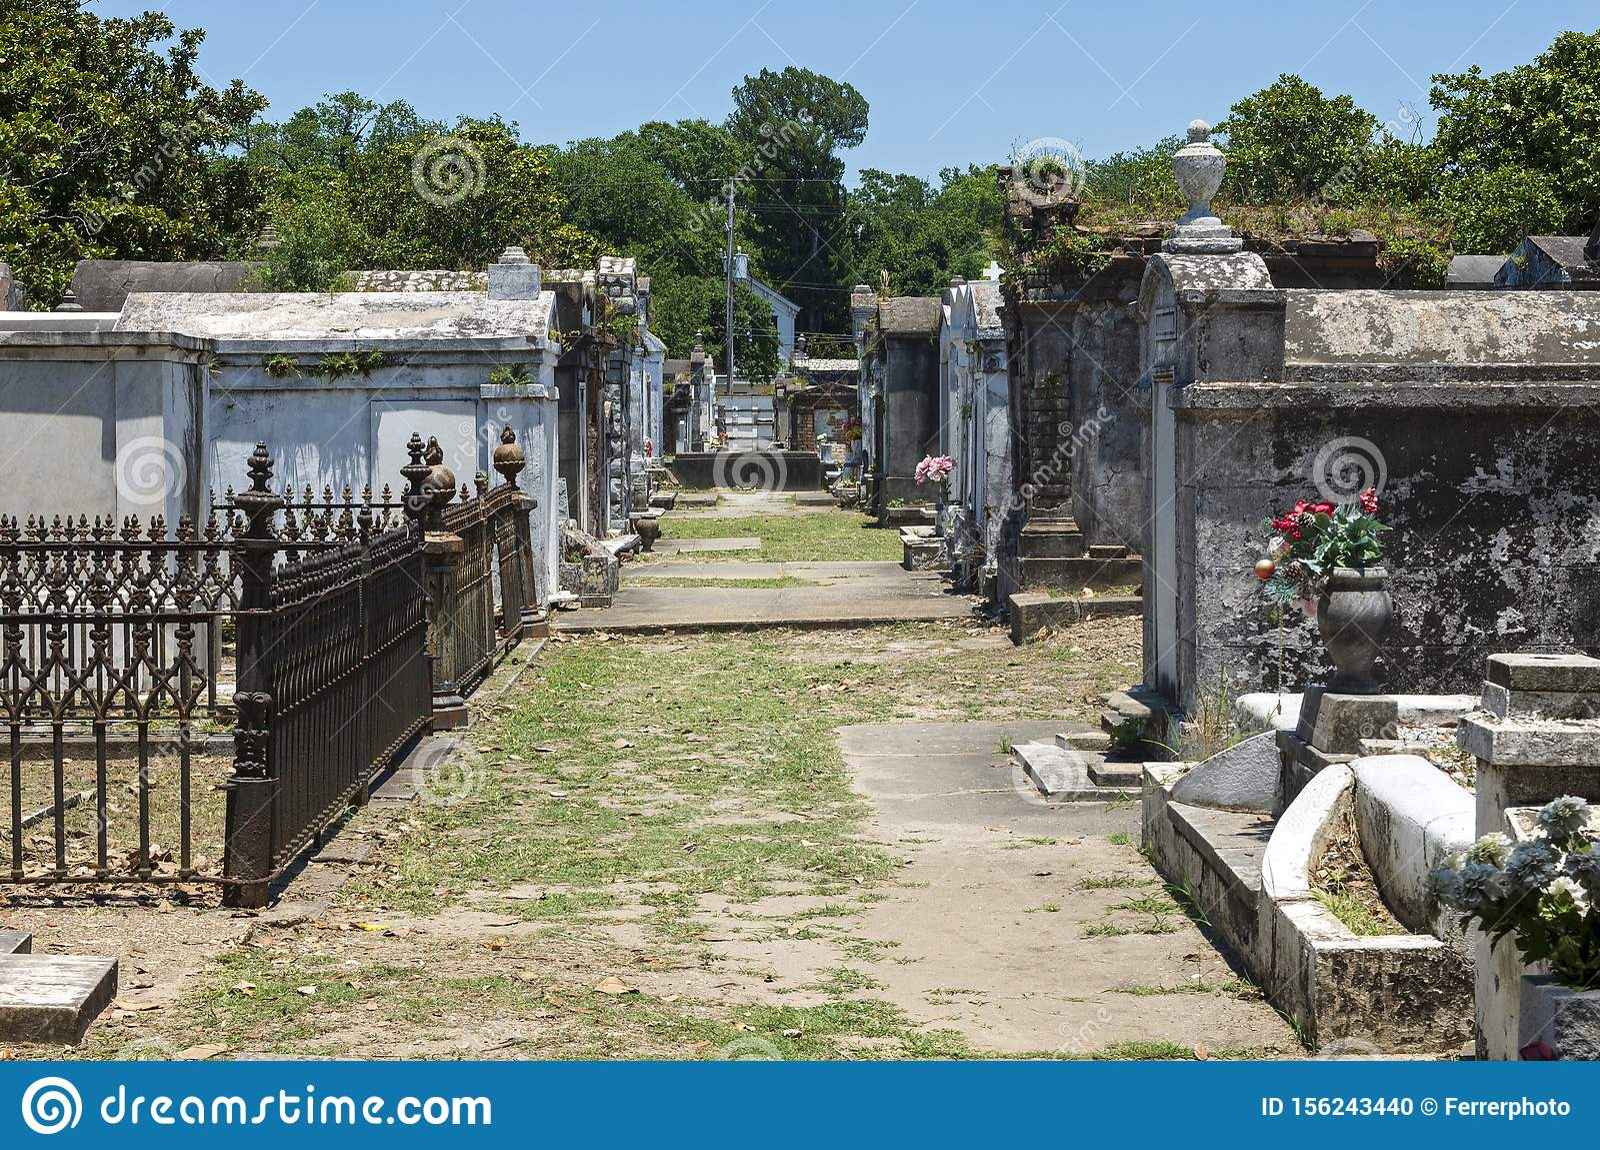 Landmark Cemetery Mausoleums in New Orleans